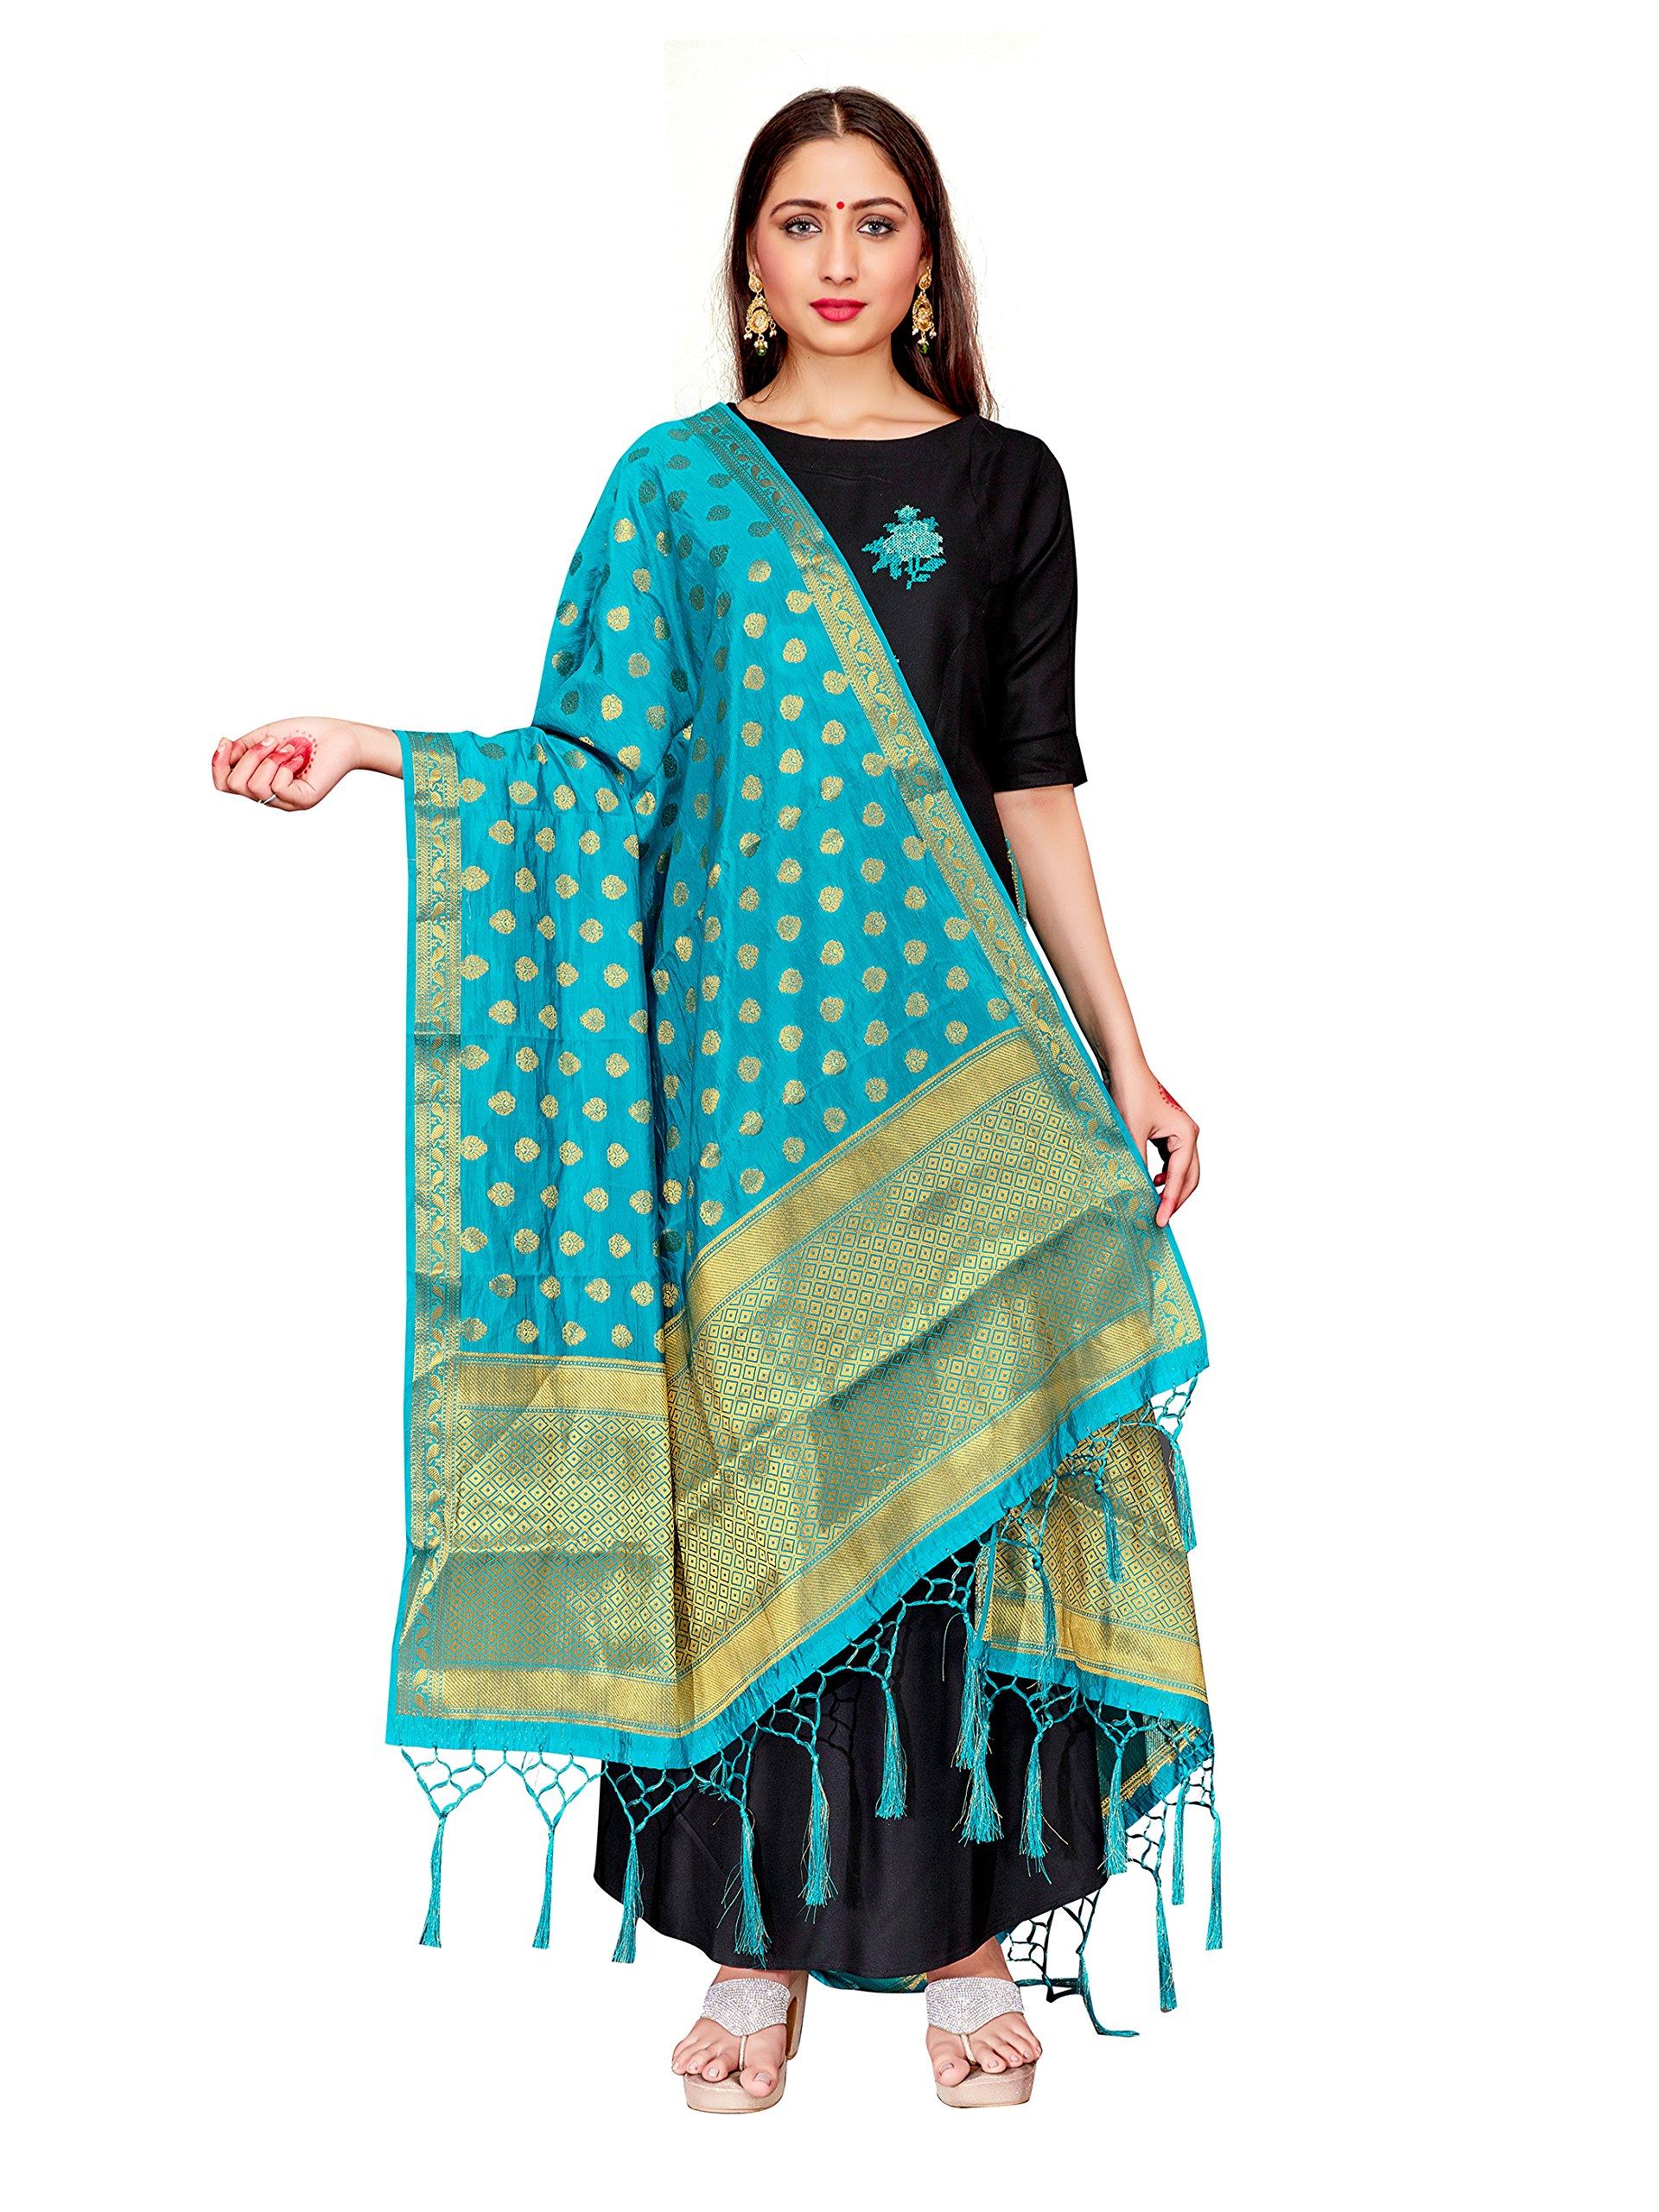 ELINA FASHION Women's Zari Work Indian Banarasi Art Silk Woven Only Dupatta for Dress Material & Salwar Suit (Turquoise)